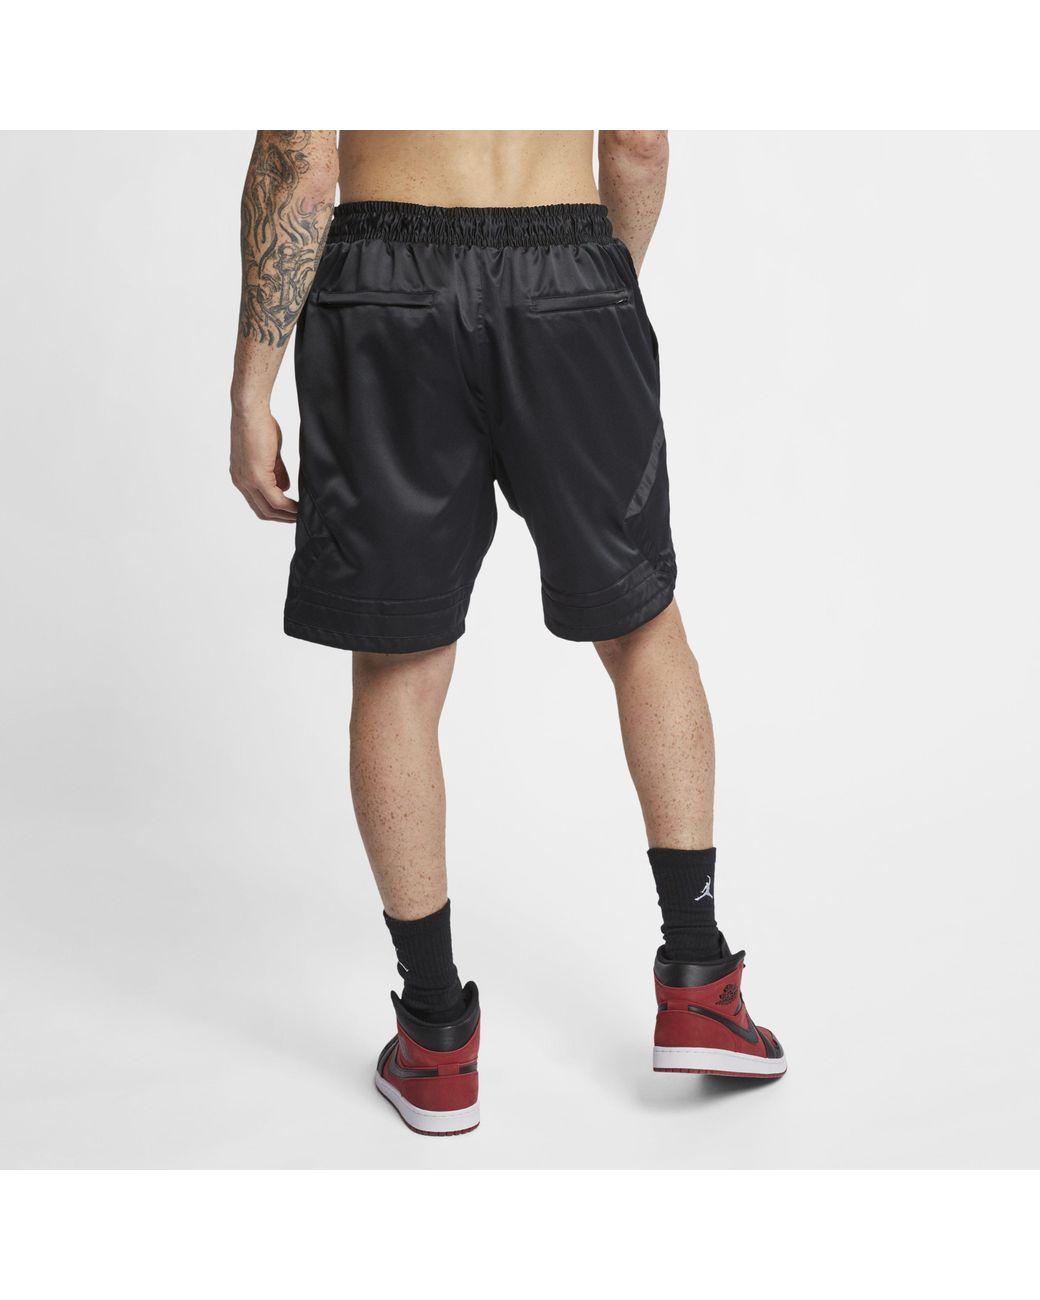 018afa1ffe9b44 Nike Jordan Satin Diamond Shorts in Black for Men - Lyst